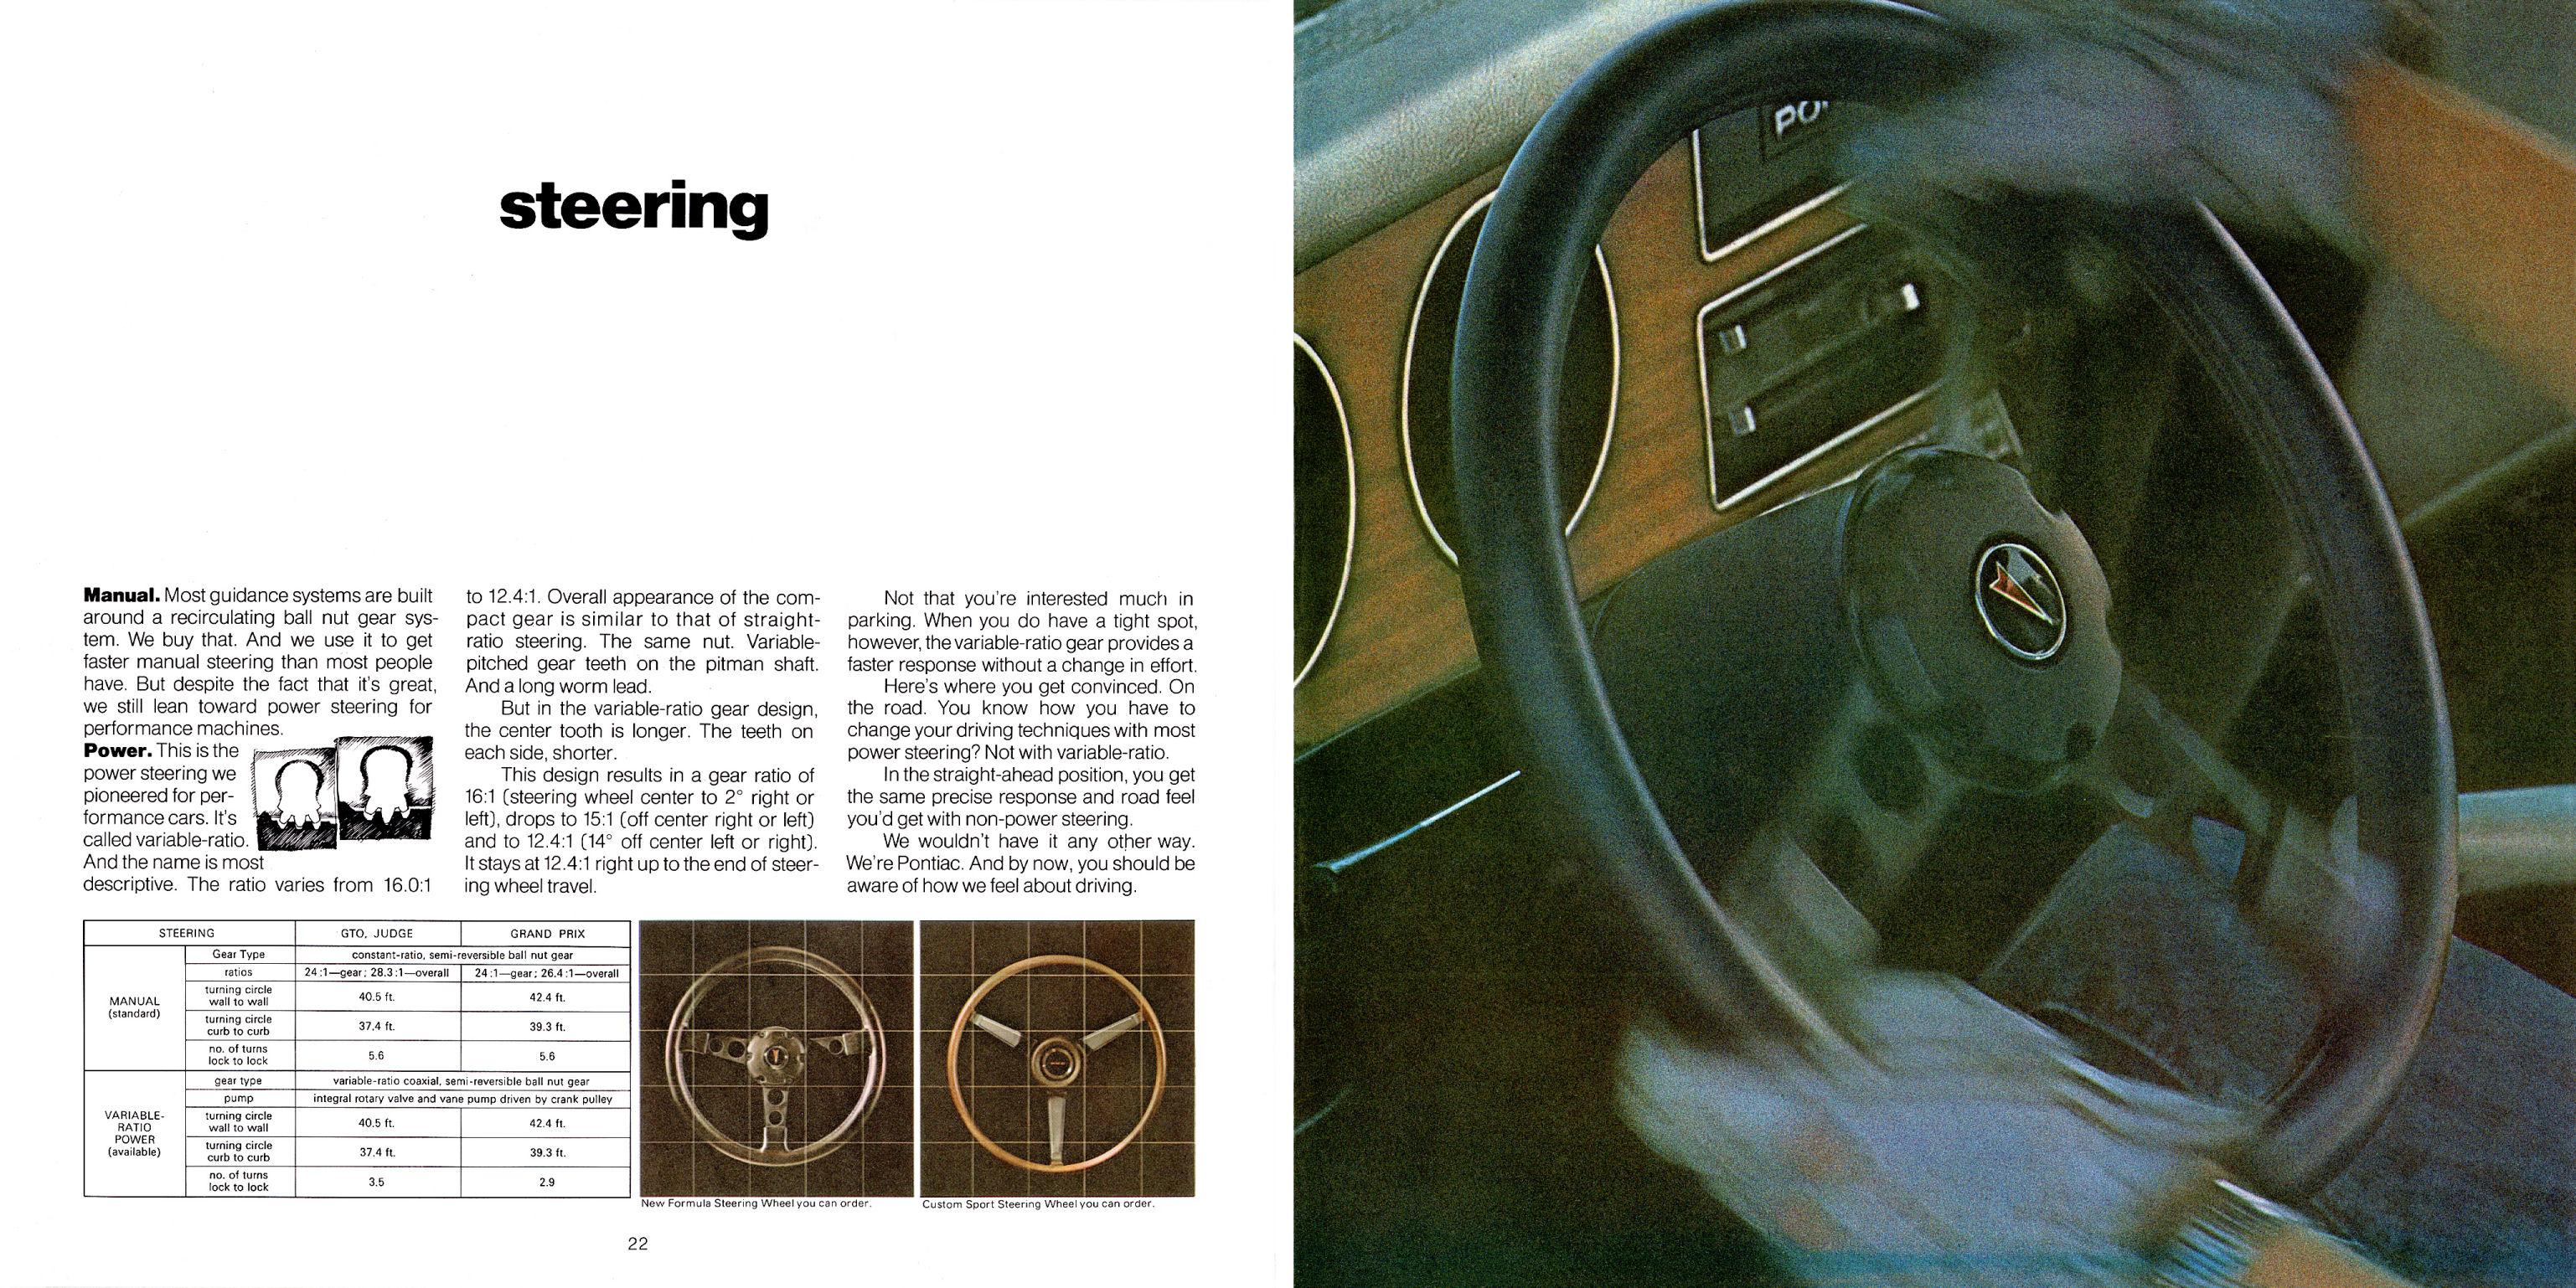 1970%20Pontiac%20Performance-22-23.jpg